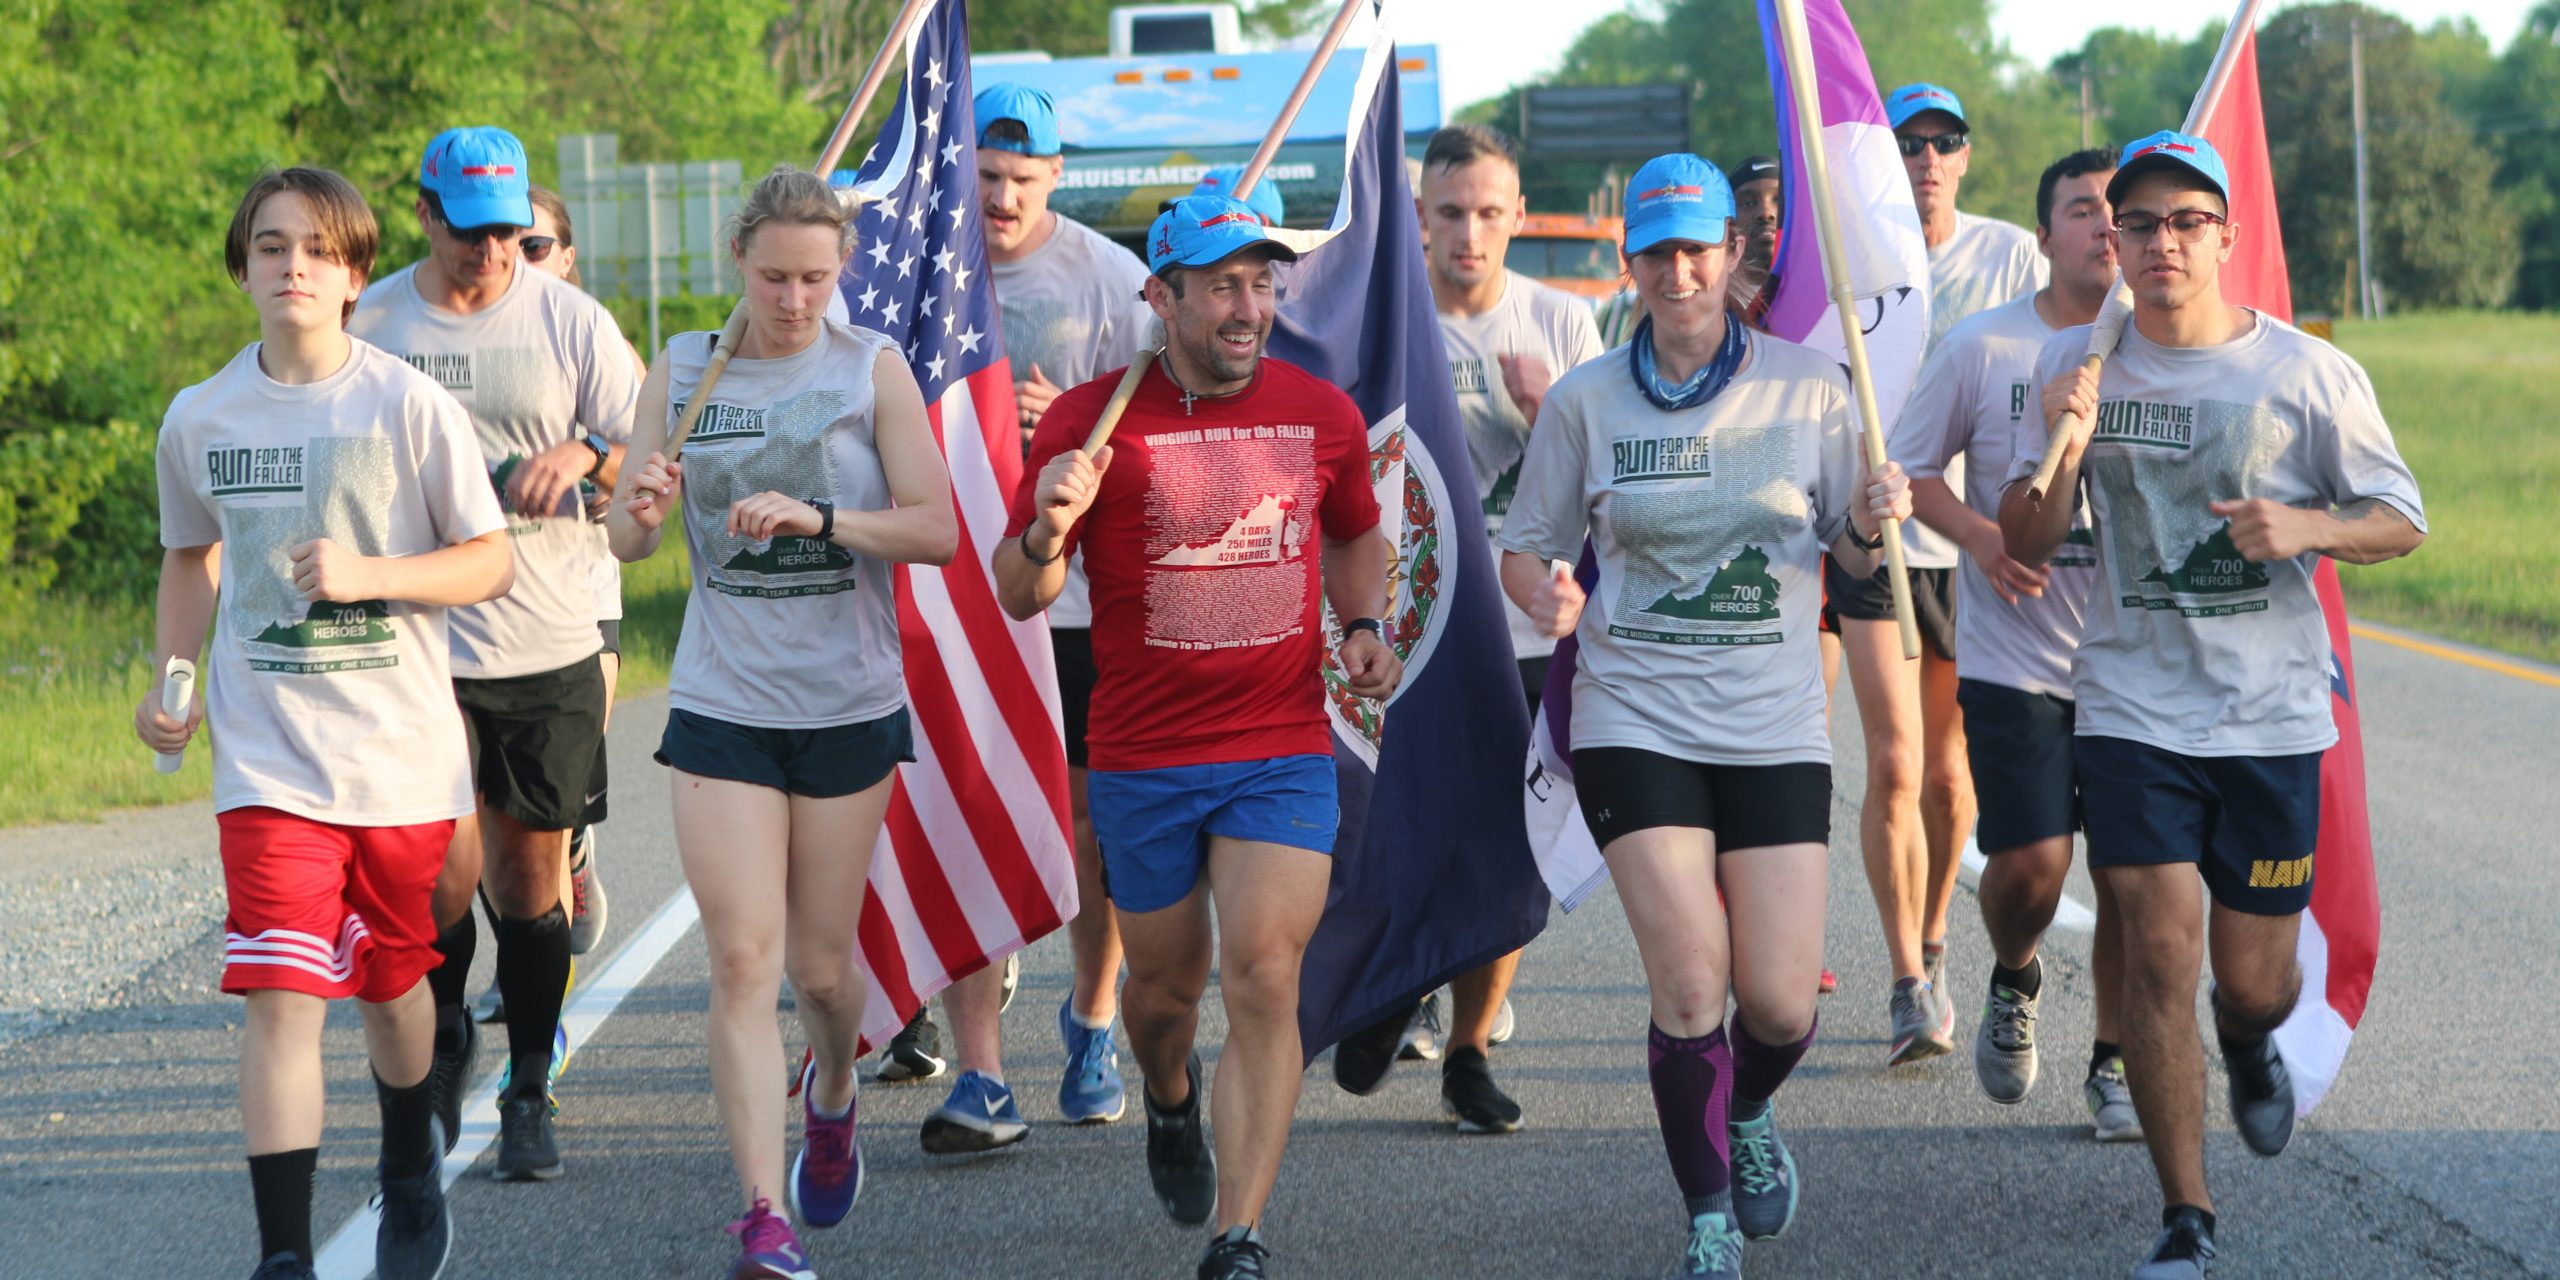 Run for the fallen Core runners